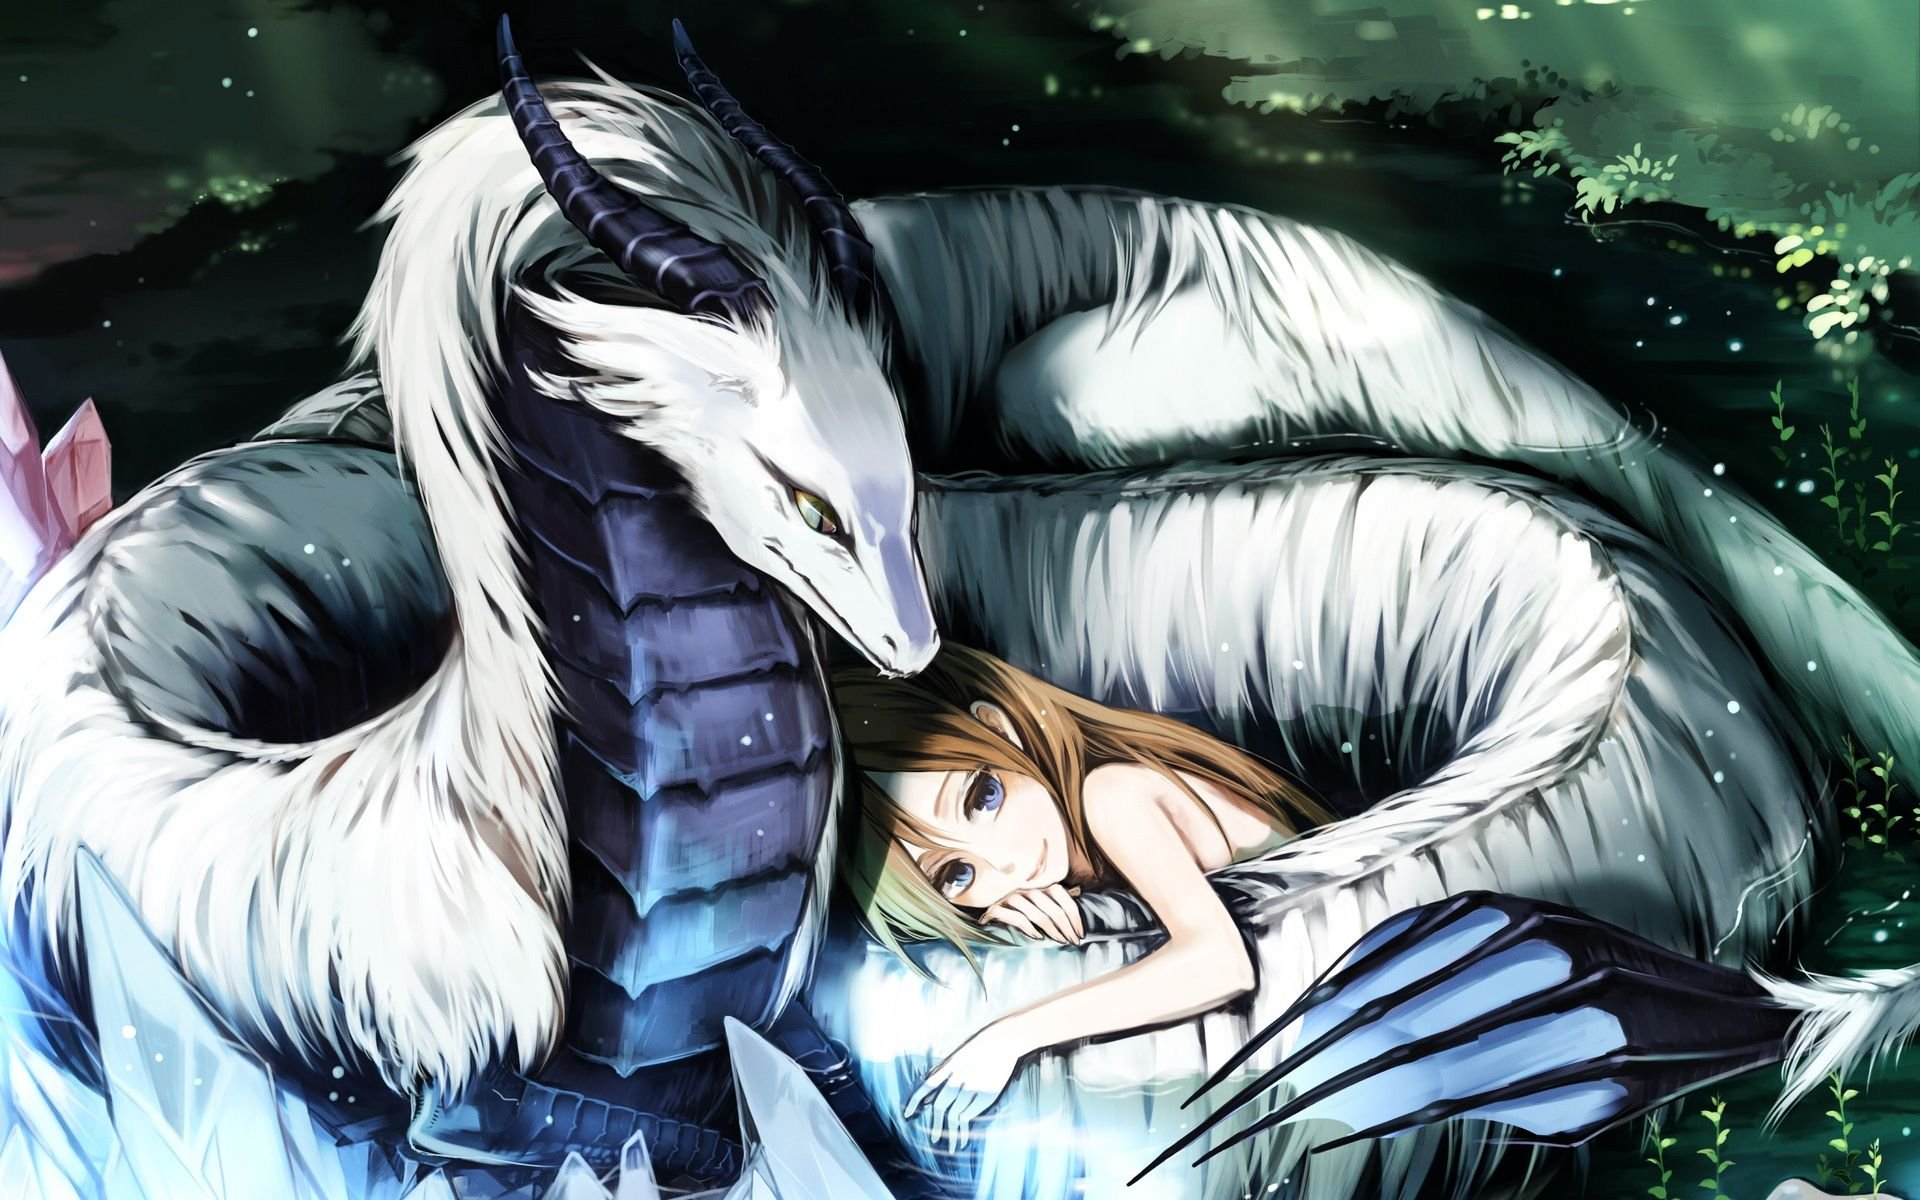 Anime Original Dragon Girl Anime Wallpaper ศิลปะ